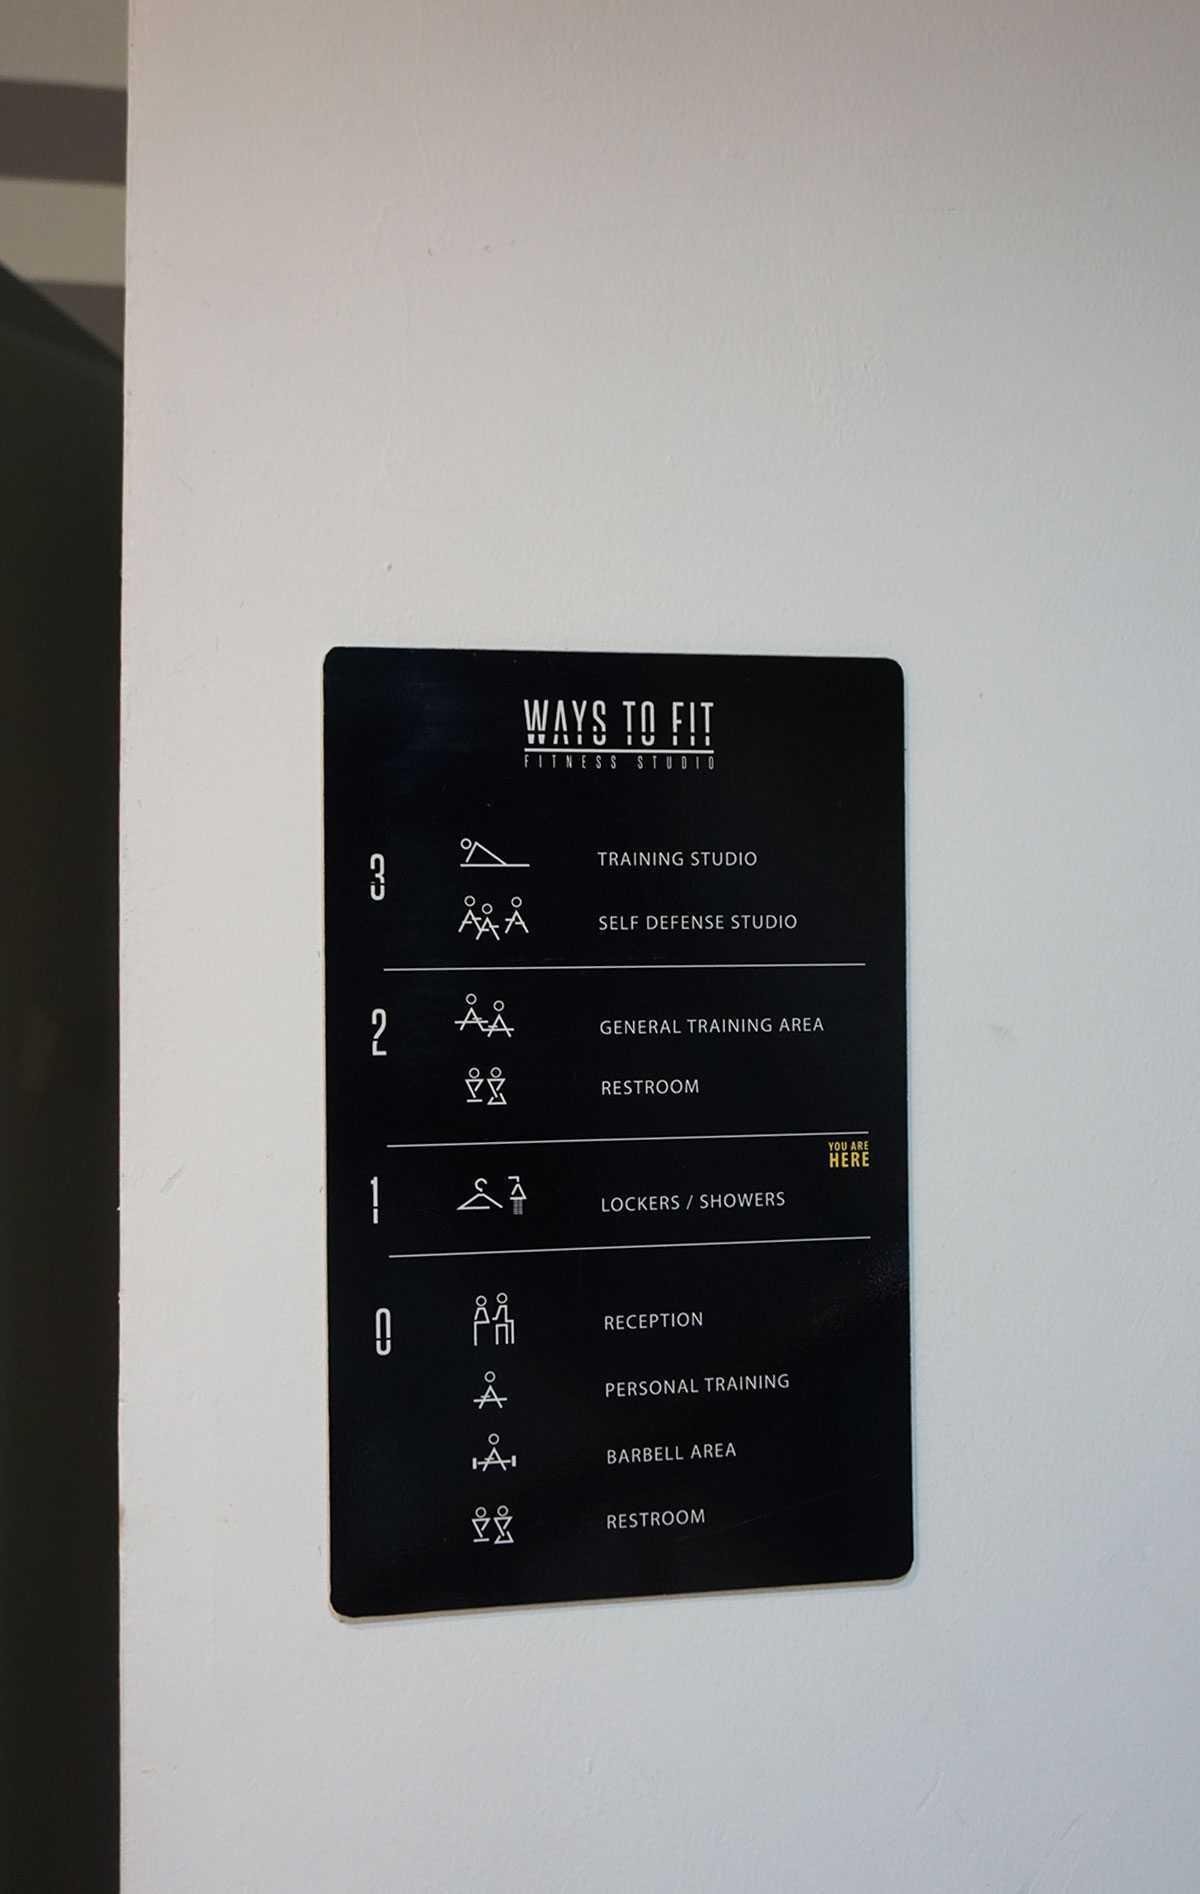 Vindo Design Ways To Fit Gym Project Plaza 5 Pondok Indah Blok C No. 6. Jln Marga Guna Raya. Pondok Indah, Rt.4/rw.11, Gandaria Utara, Kby. Baru, Kota Jakarta Selatan, Daerah Khusus Ibukota Jakarta 12310, Indonesia Plaza 5 Pondok Indah Blok C No. 6. Jln Marga Guna Raya. Pondok Indah, Rt.4/rw.11, Gandaria Utara, Kby. Baru, Kota Jakarta Selatan, Daerah Khusus Ibukota Jakarta 12310, Indonesia Vindo-Design-Ways-To-Fit-Gym-Project Modern  55918